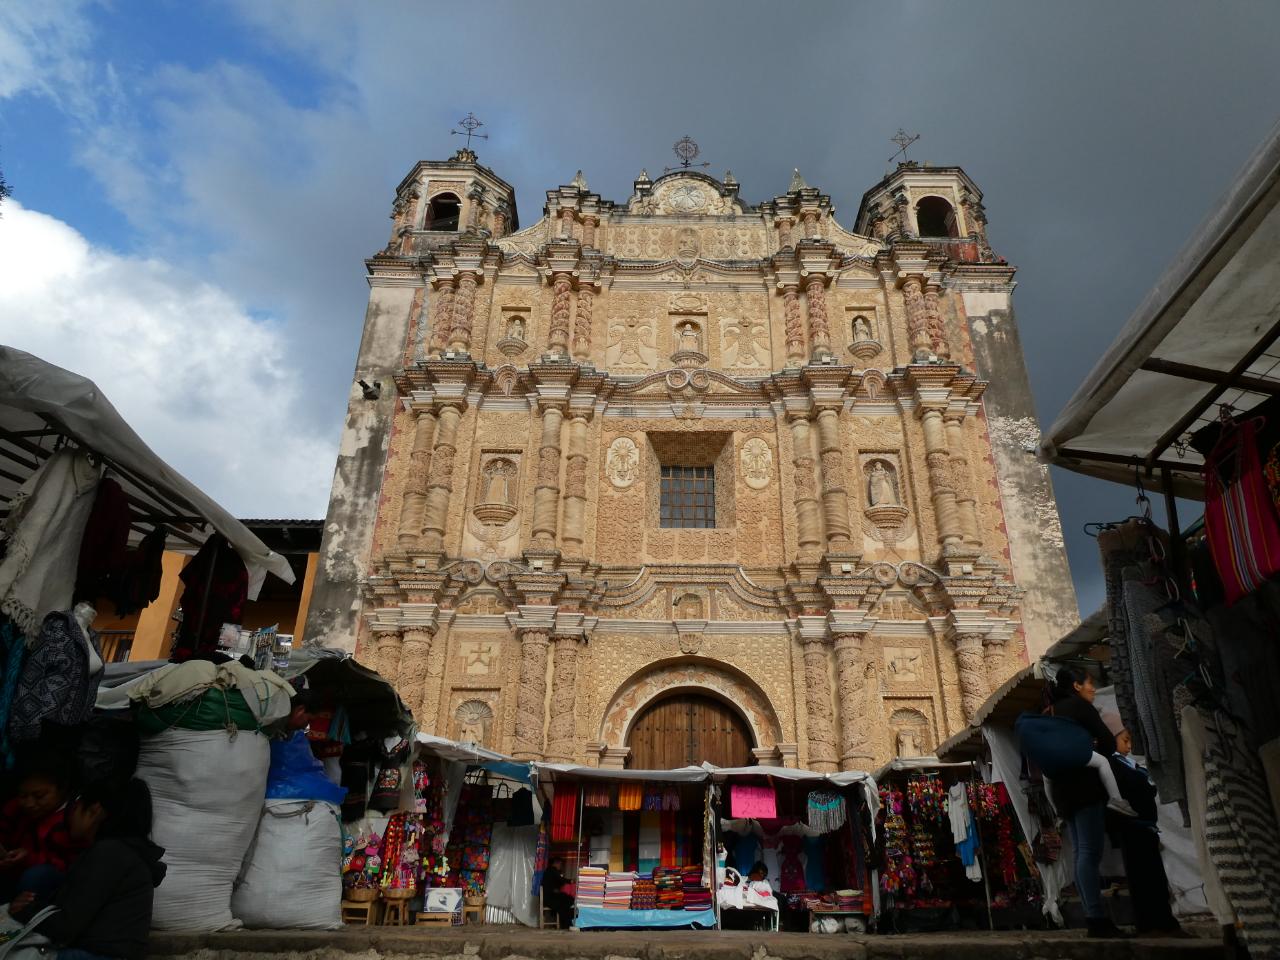 Photo 1: San Cristobal de las Casas, Chiapas, Mexique